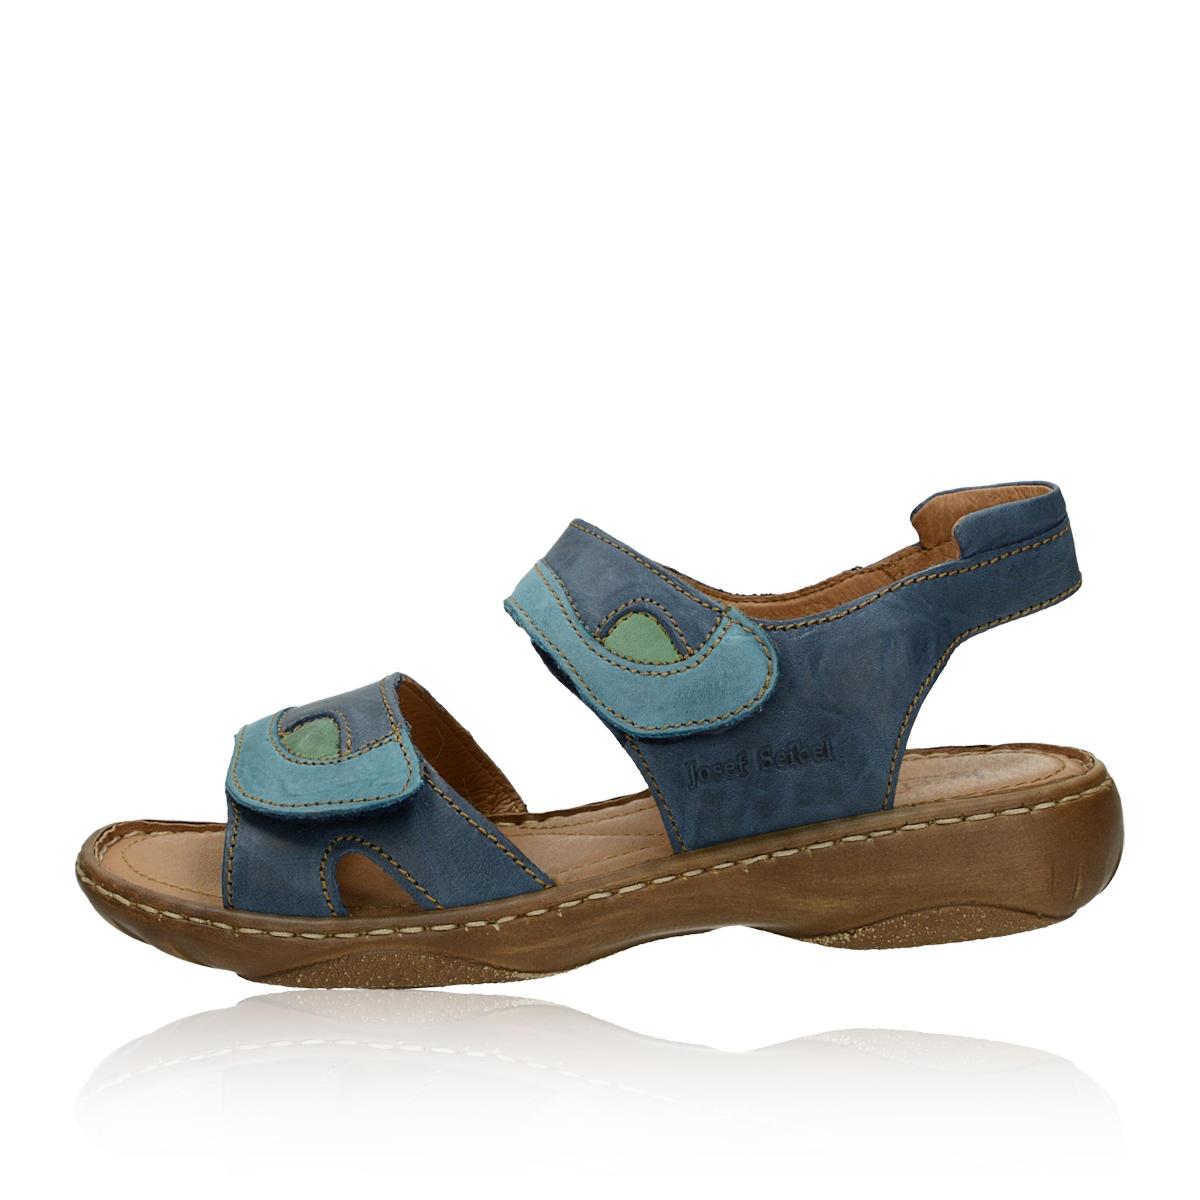 25d9a10ef7dff Josef Seibel dámske kožené sandále - modré | 76444.95502-BLUmulti ...